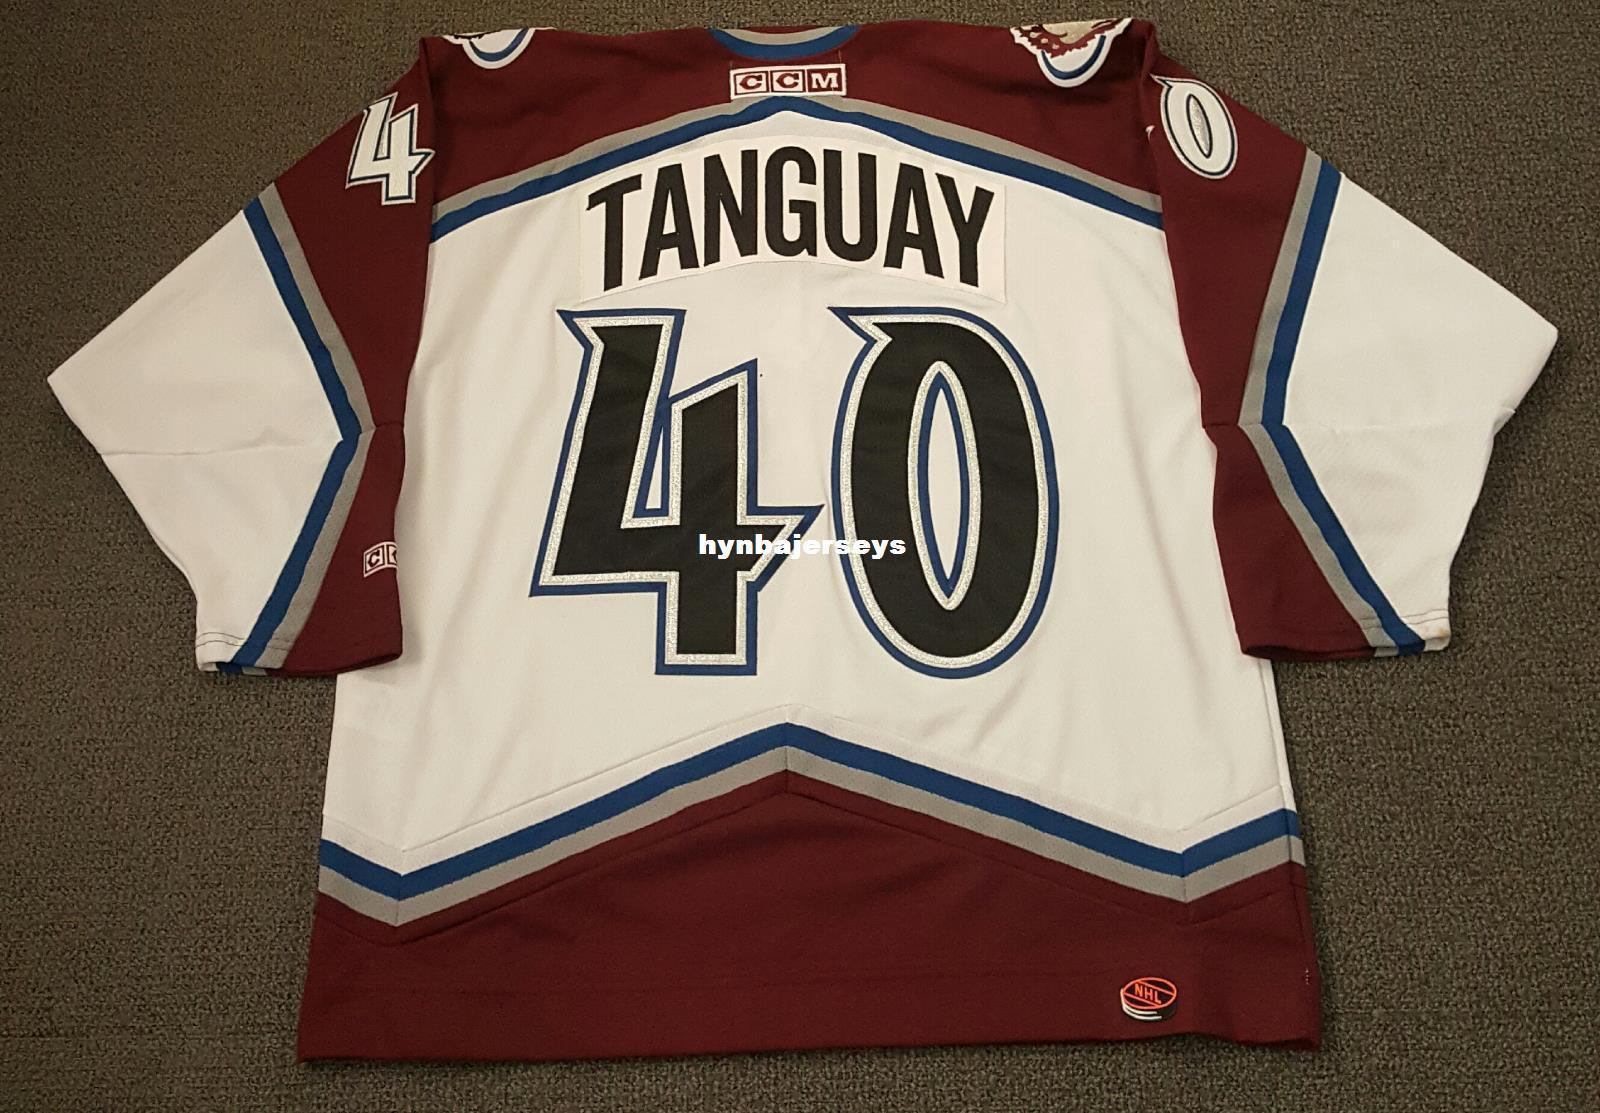 2019 Custom Alex Tanguay Vintage Colorado Avalanche CCM Cheap Hockey Jersey  White Mens Retro Jerseys From Hynbajerseys 2048ae0b9